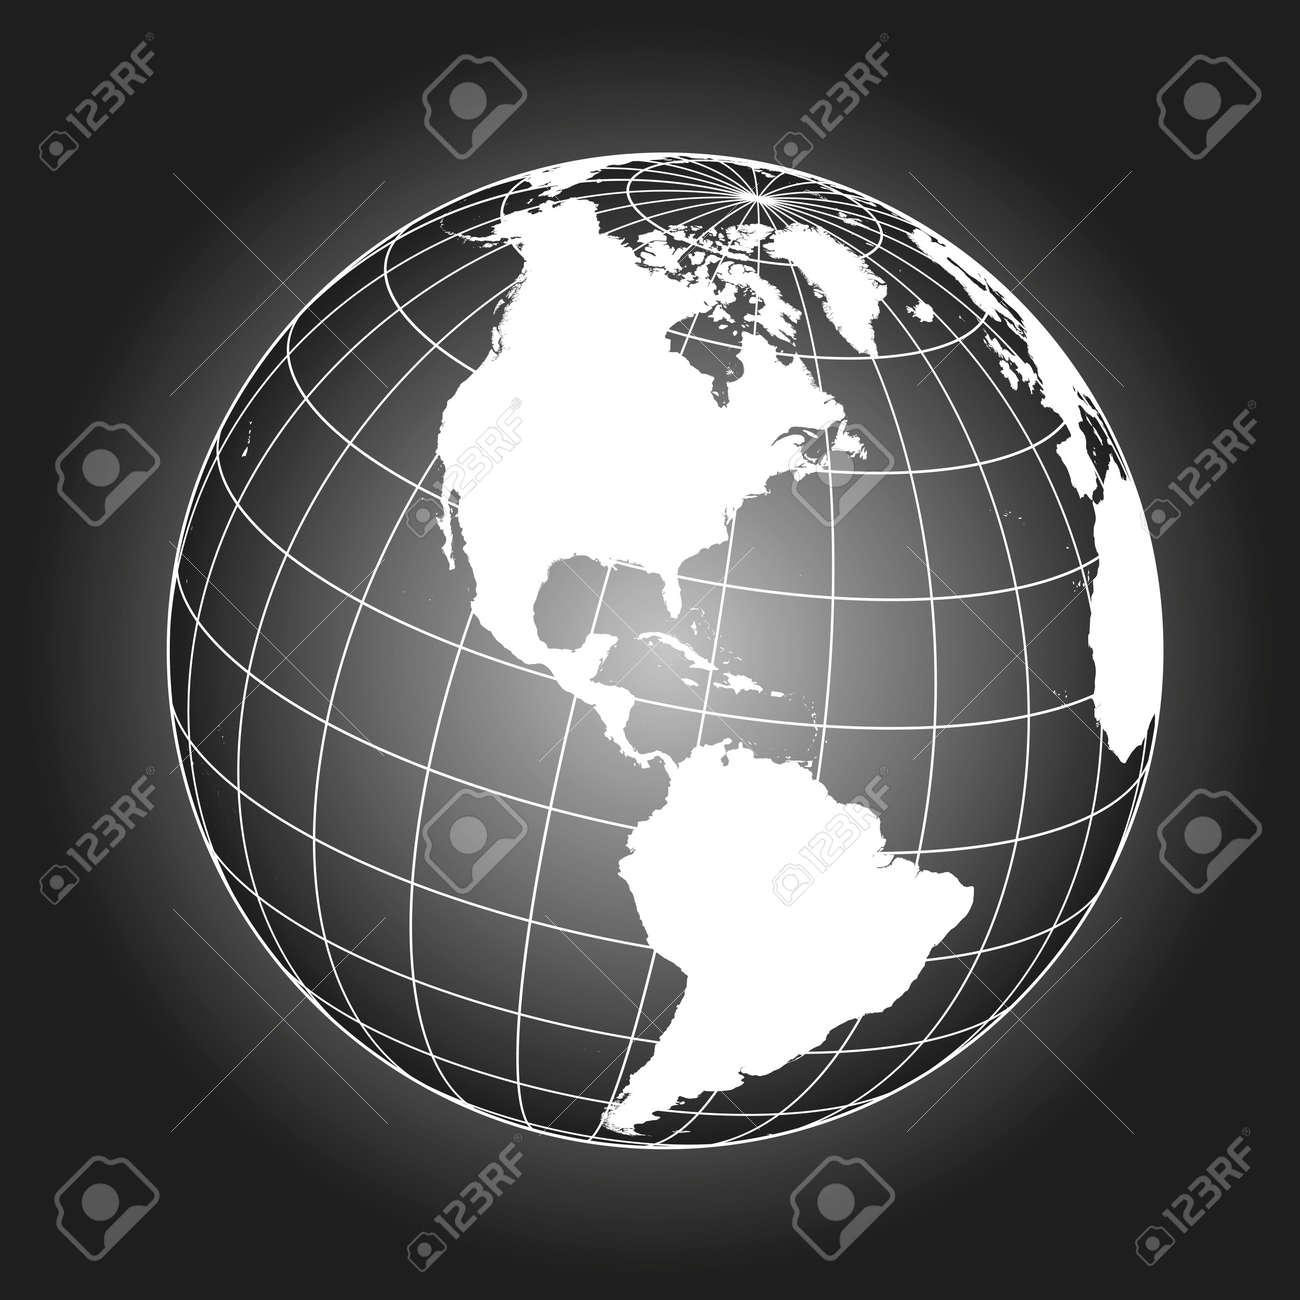 North america map europe greenland north pole south america north america map europe greenland north pole south america earth globe gumiabroncs Gallery